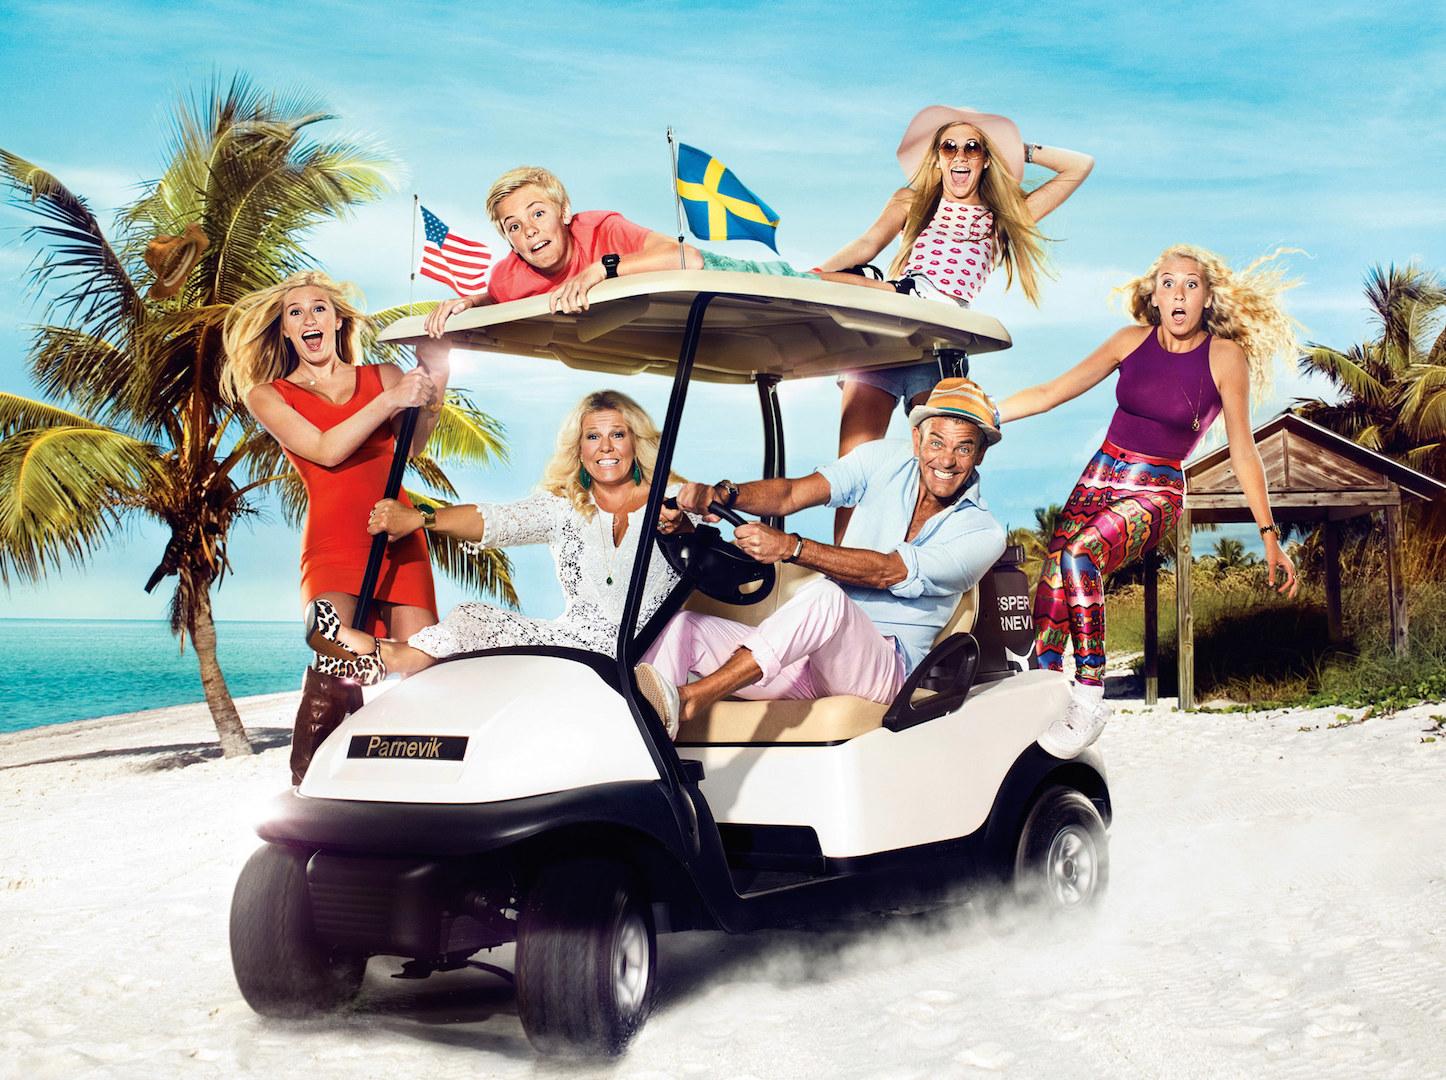 Jesper Parnevik now a reality TV Star